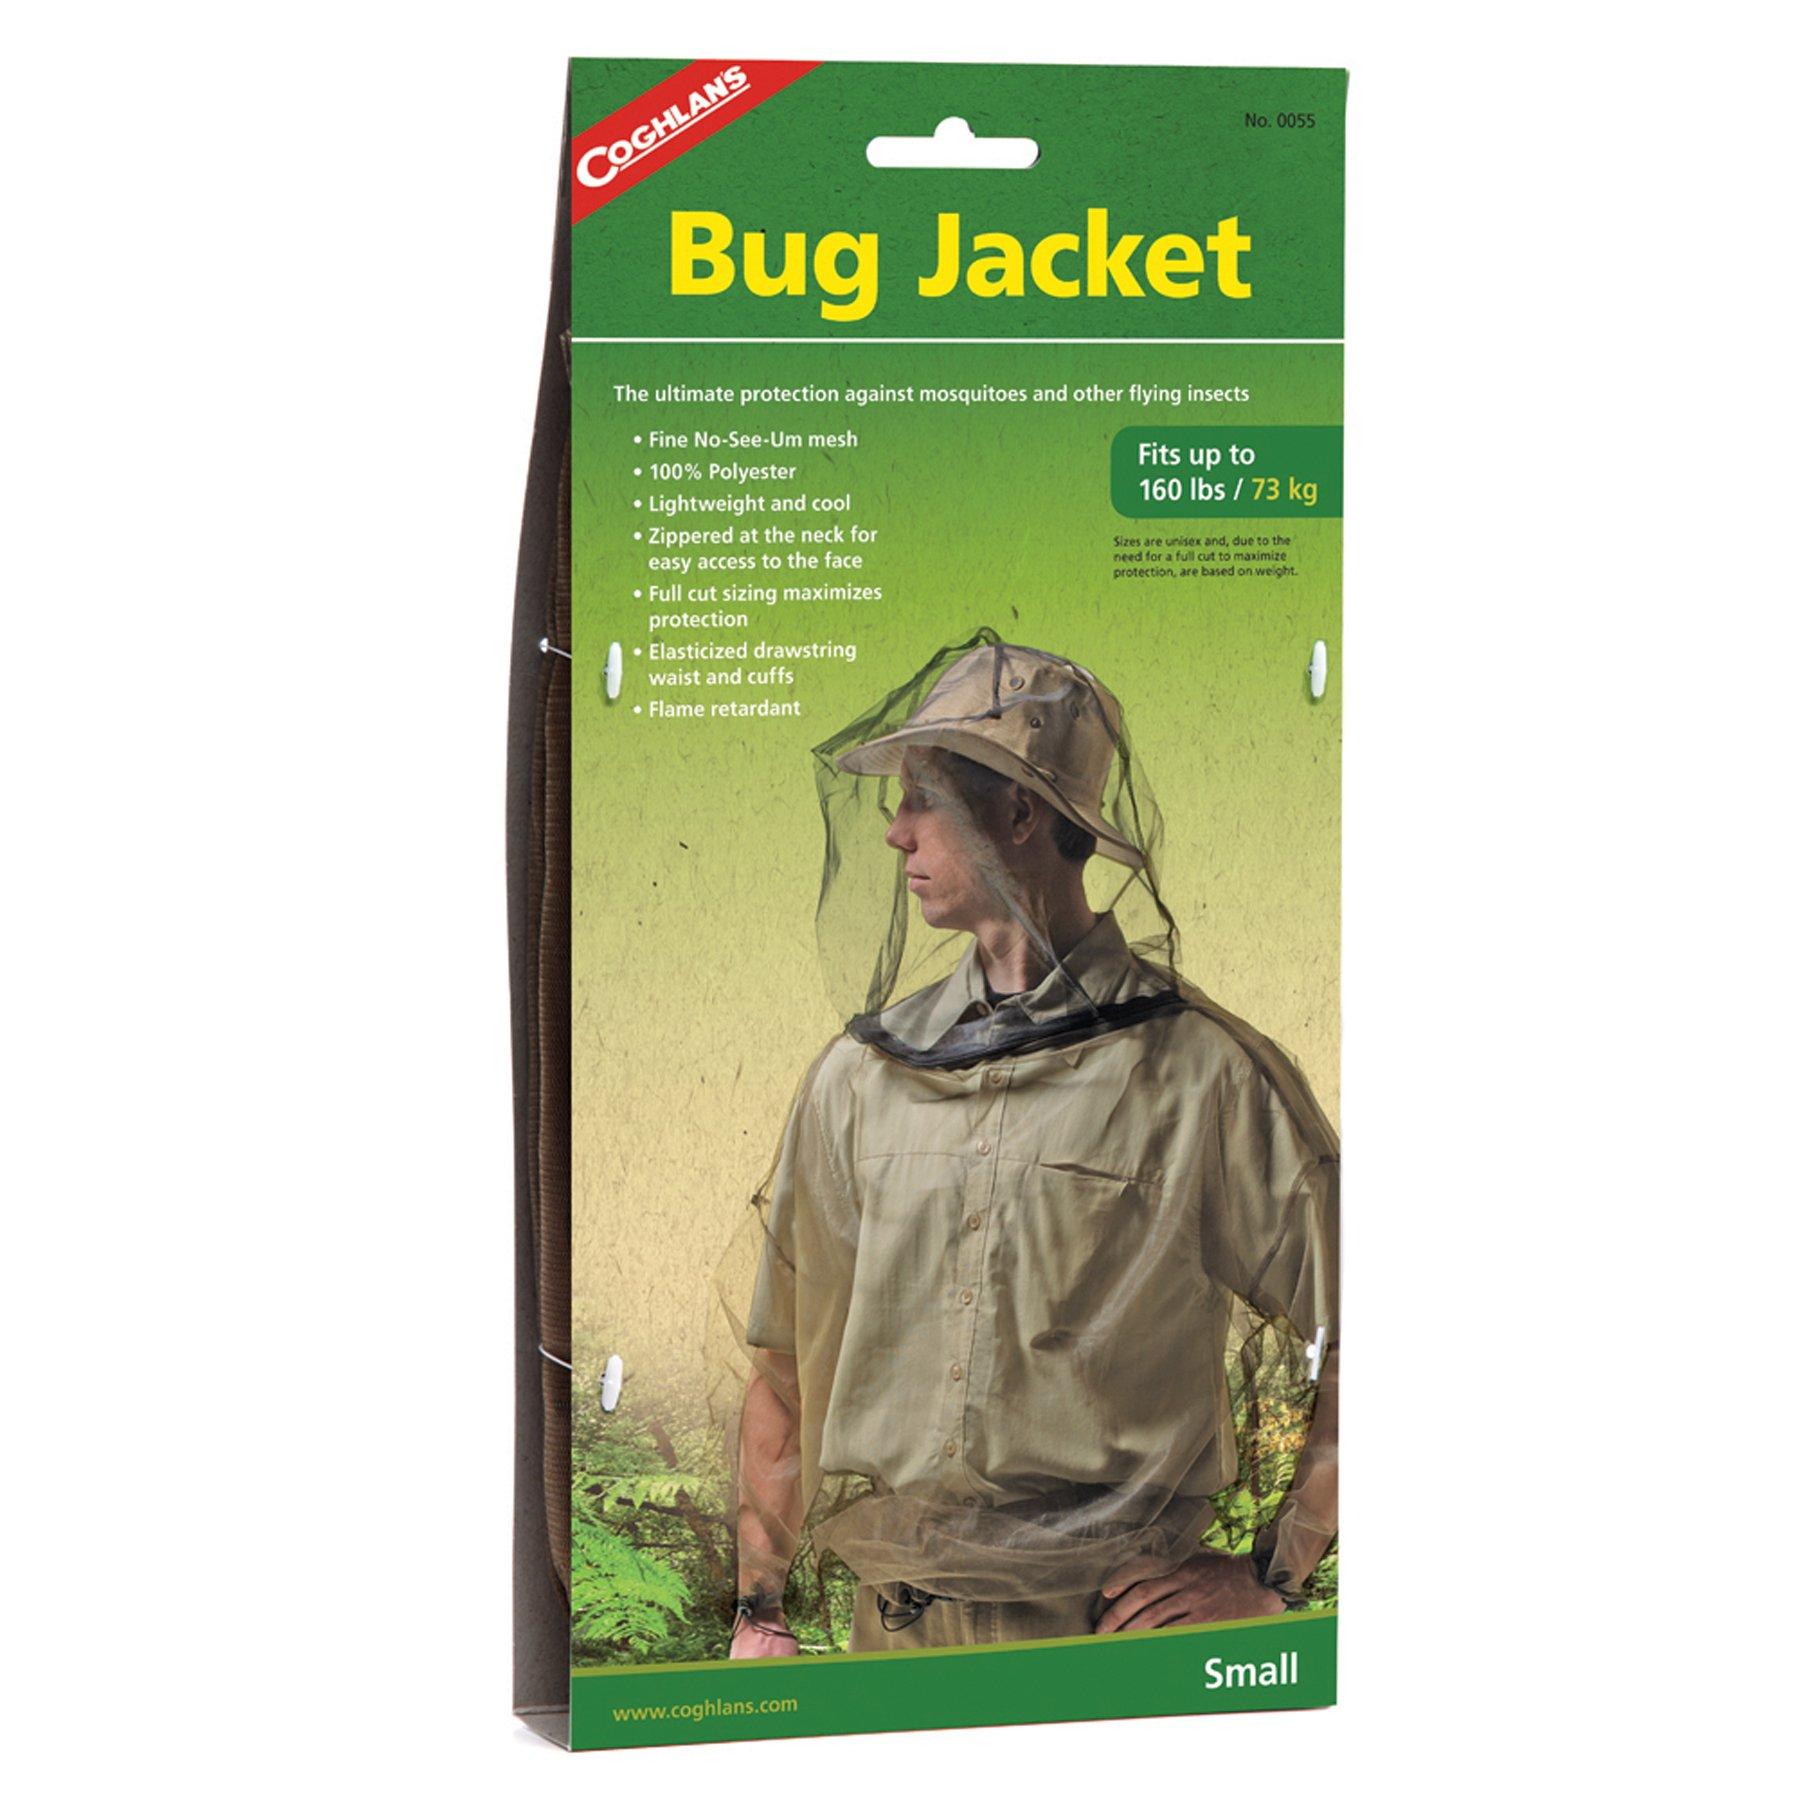 Coghlan's Bug Jacket, Large by Coghlan's